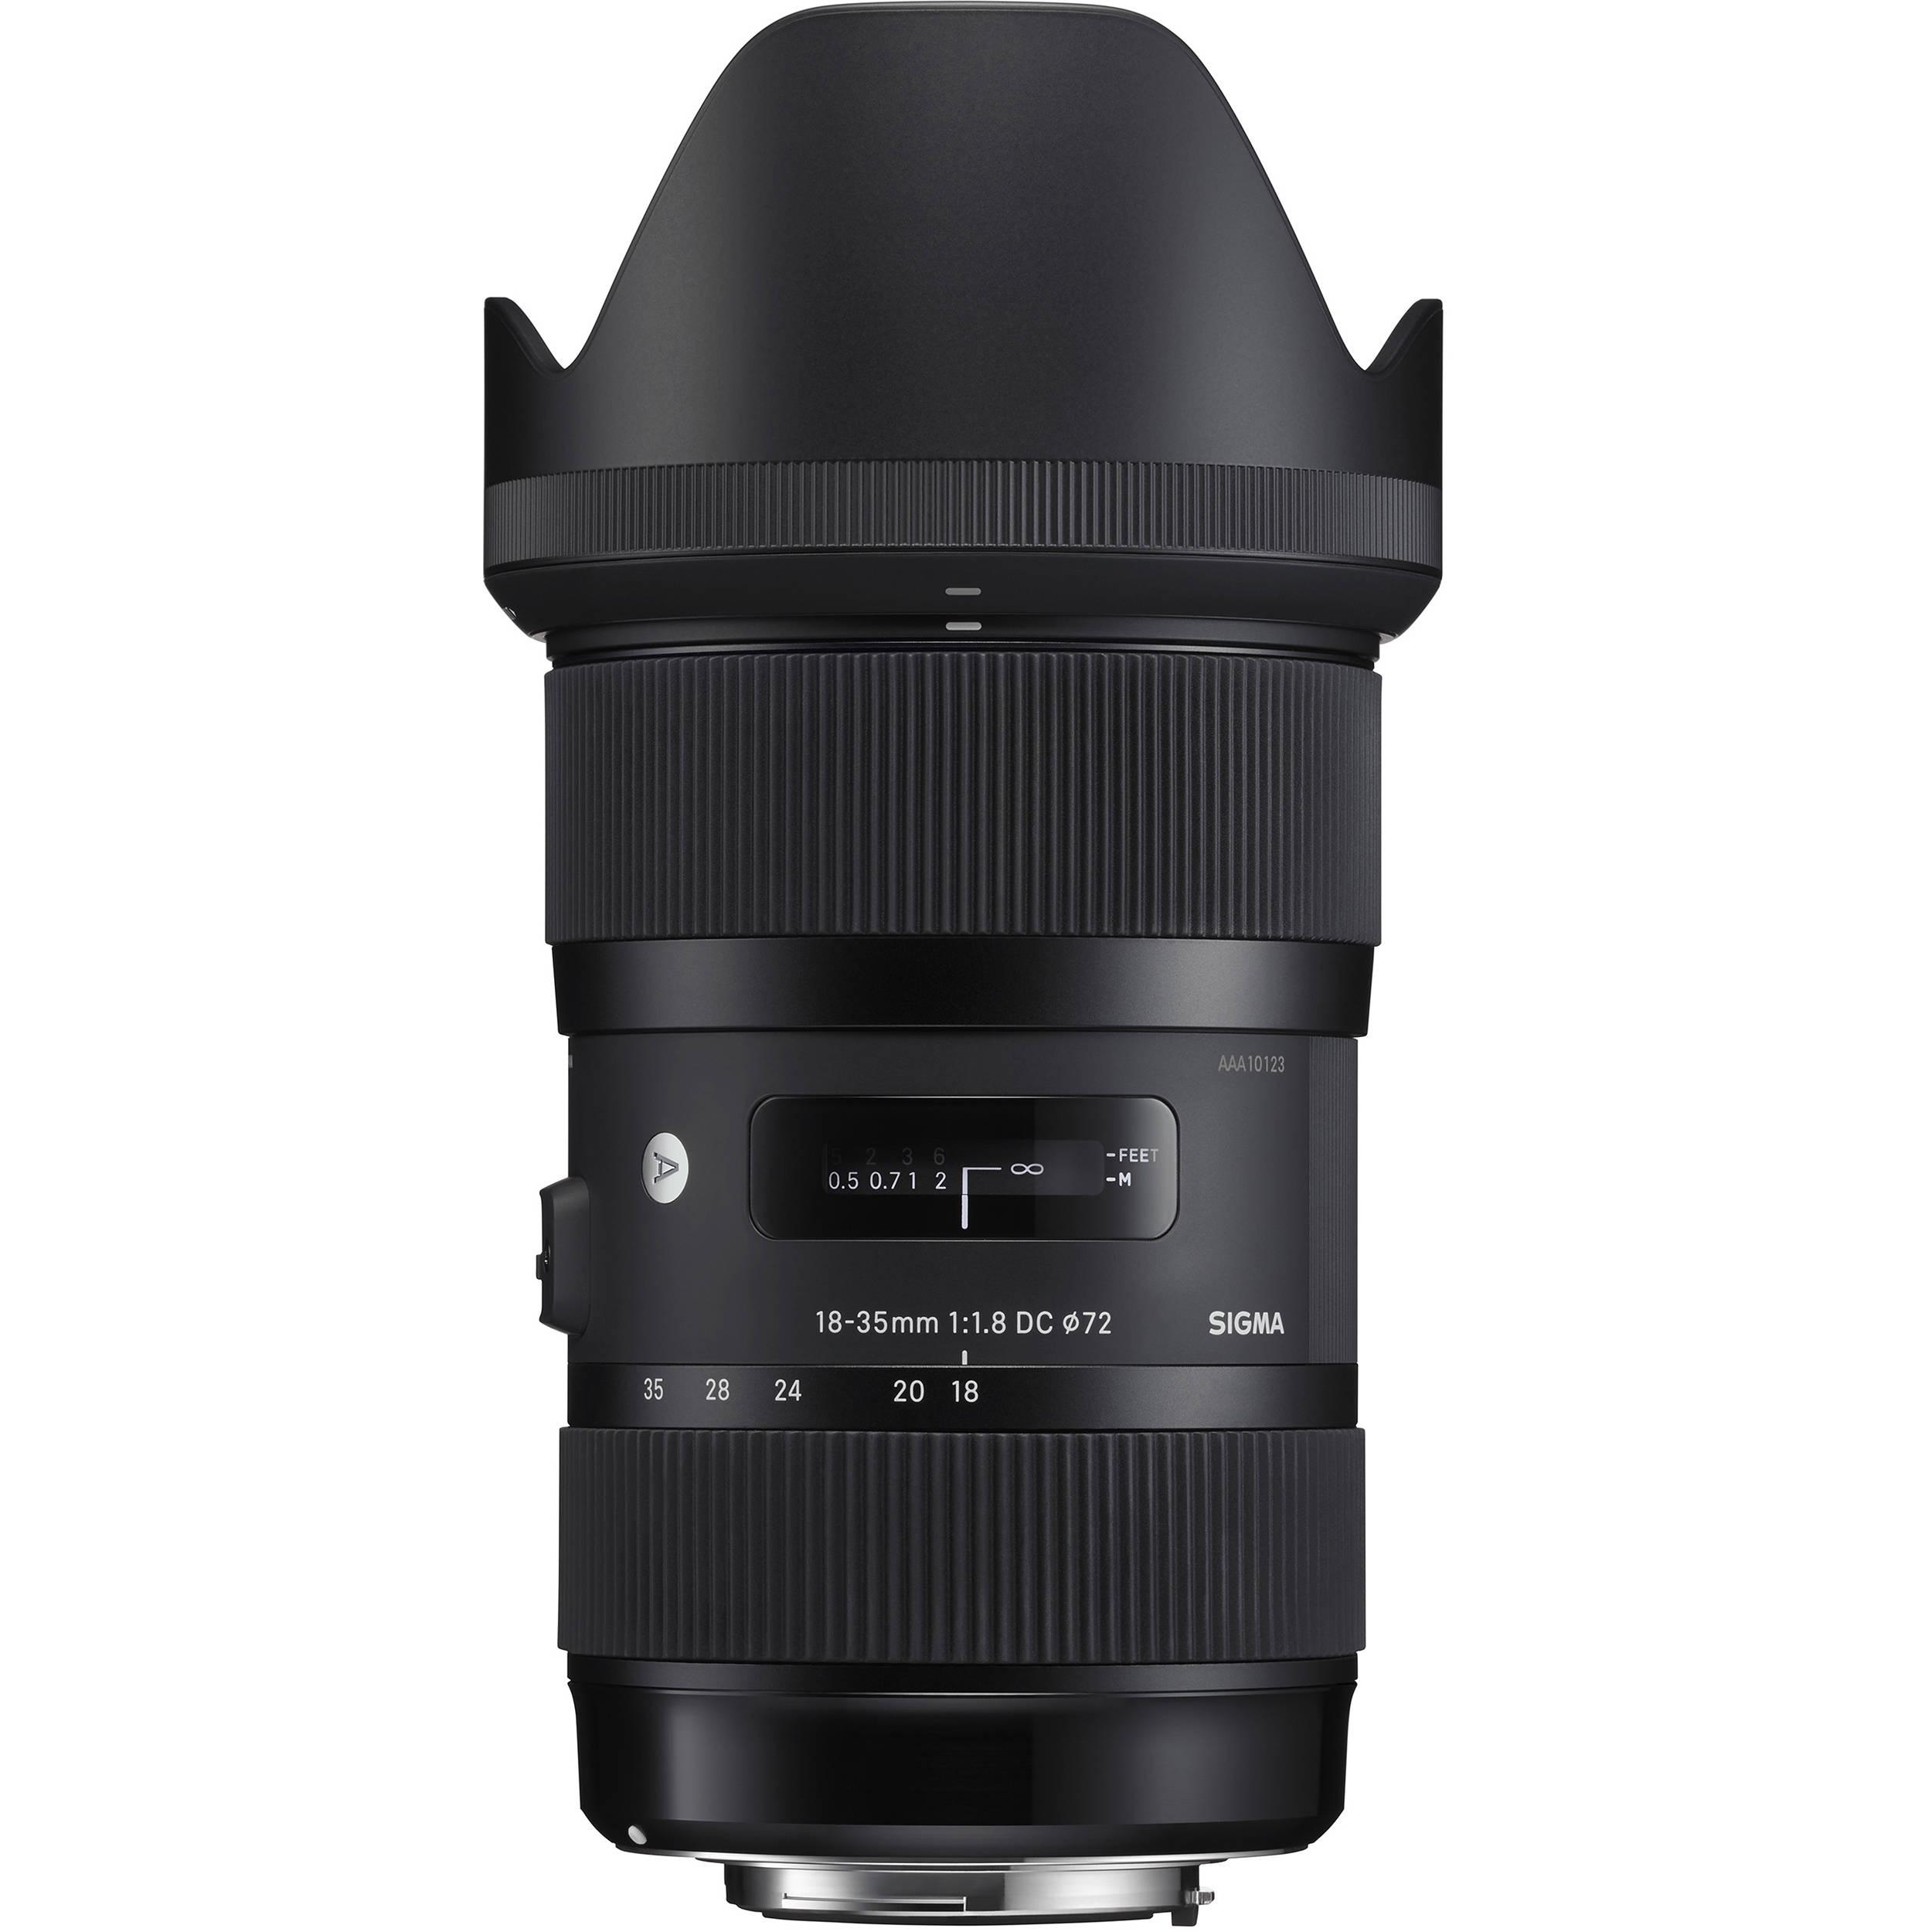 Sigma 18-35mm f/1 8 DC HSM Art Lens for Nikon F